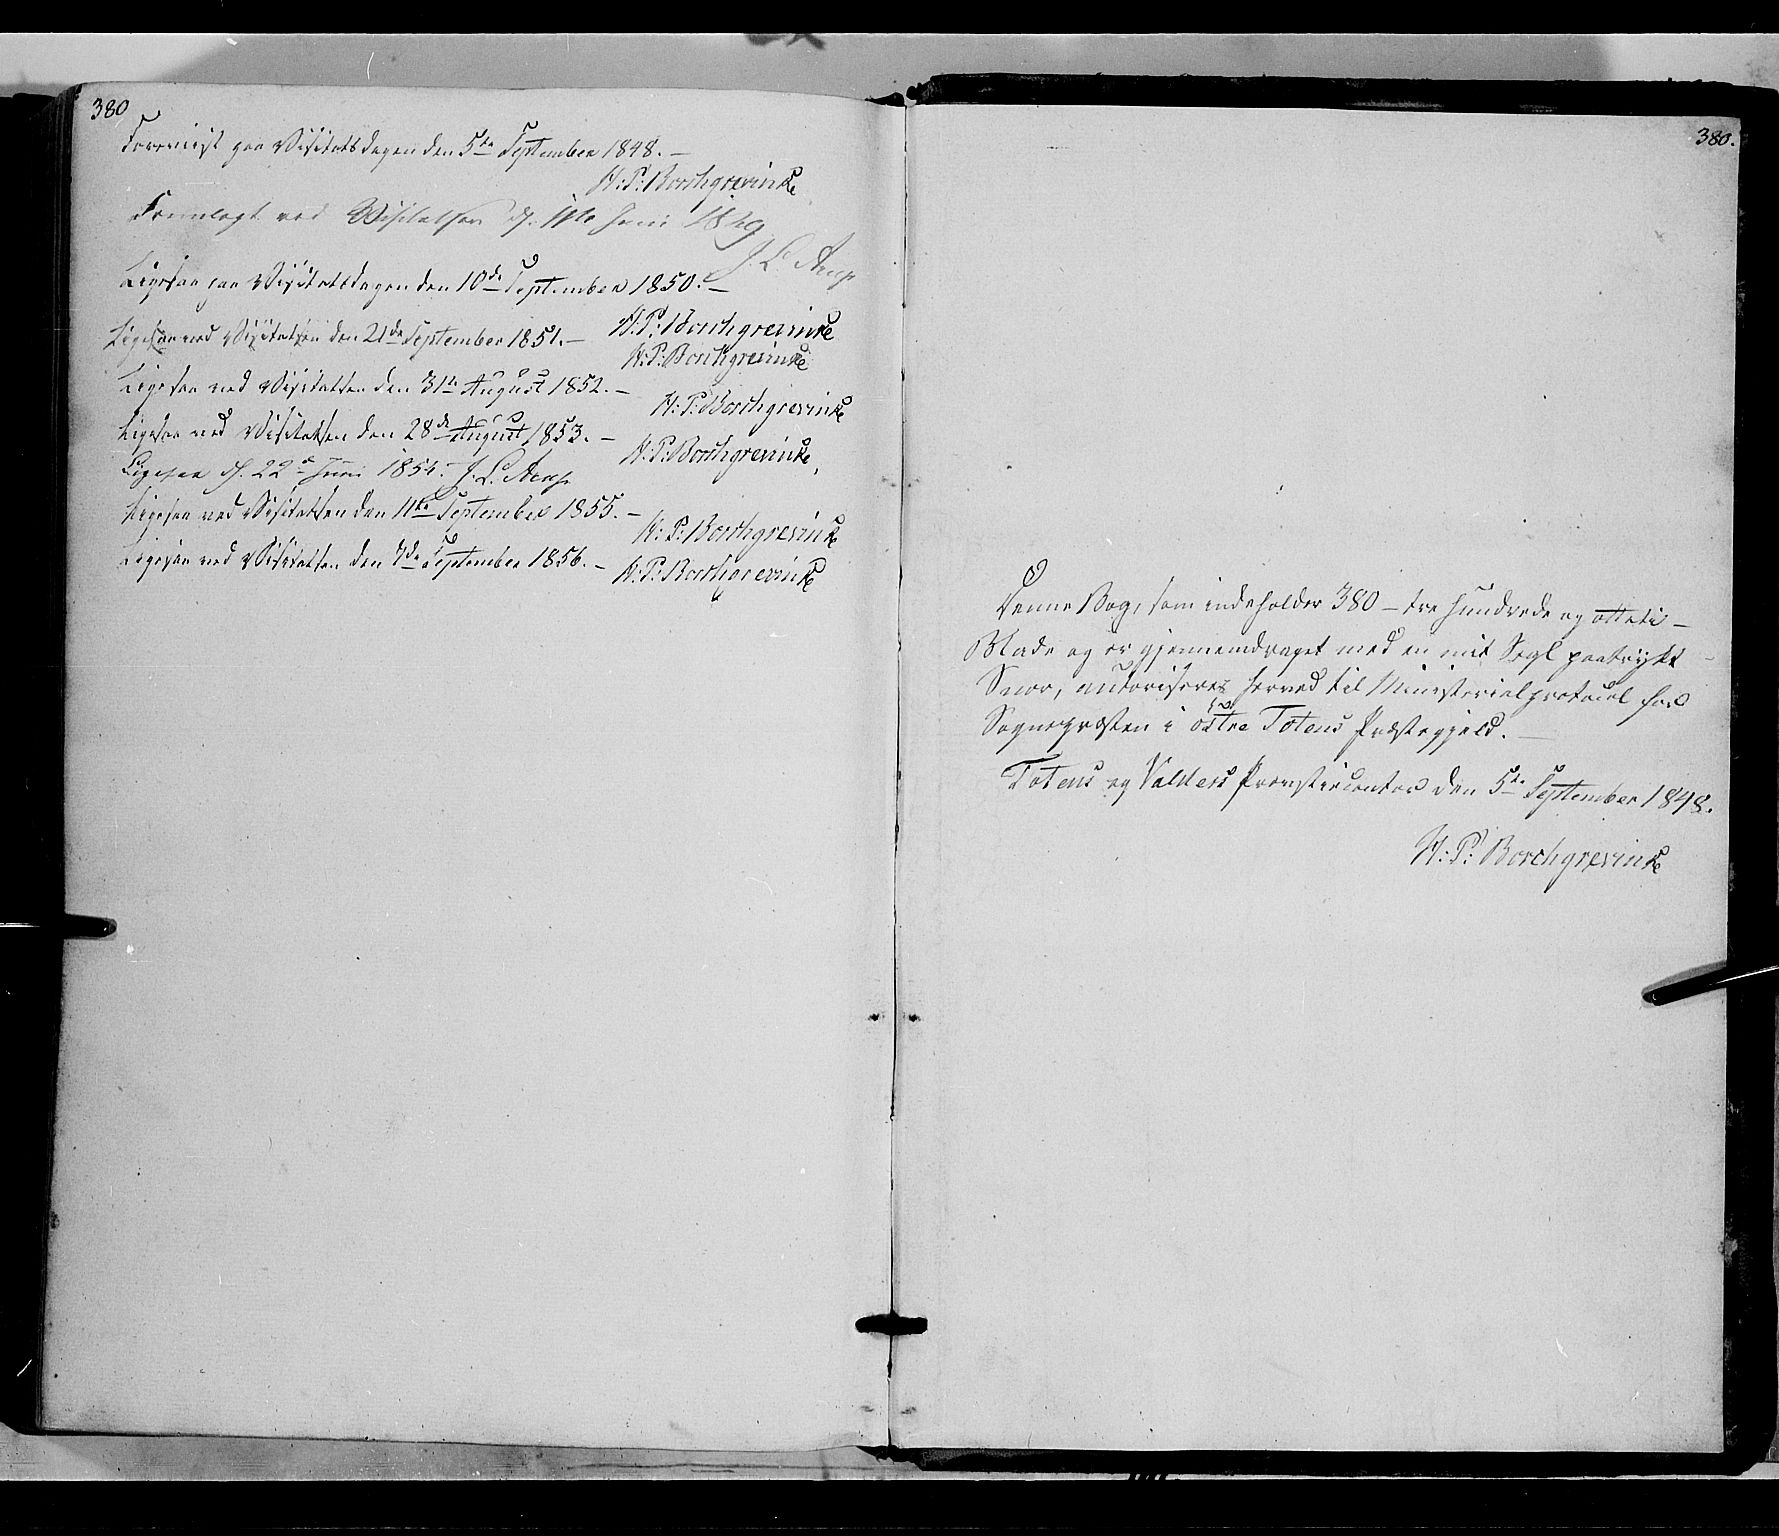 SAH, Østre Toten prestekontor, Ministerialbok nr. 3, 1848-1856, s. 380